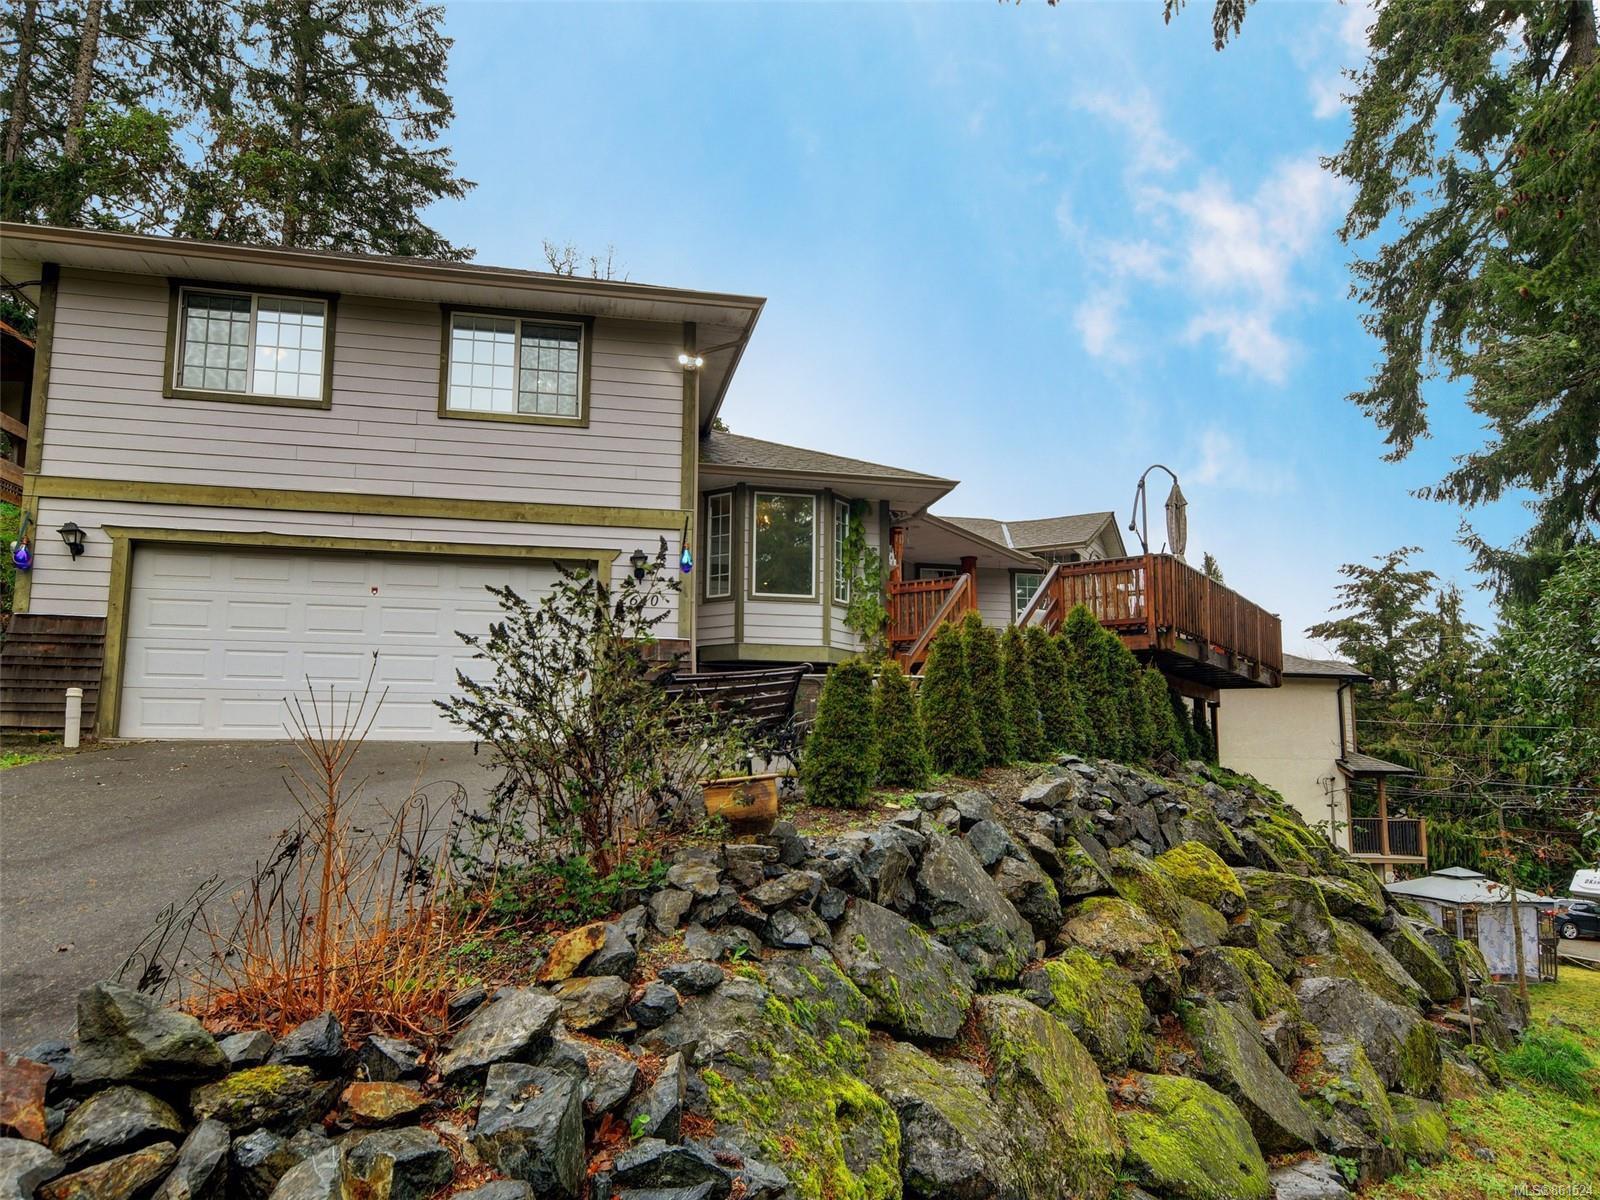 Main Photo: 2610 Selwyn Rd in : La Mill Hill House for sale (Langford)  : MLS®# 861524